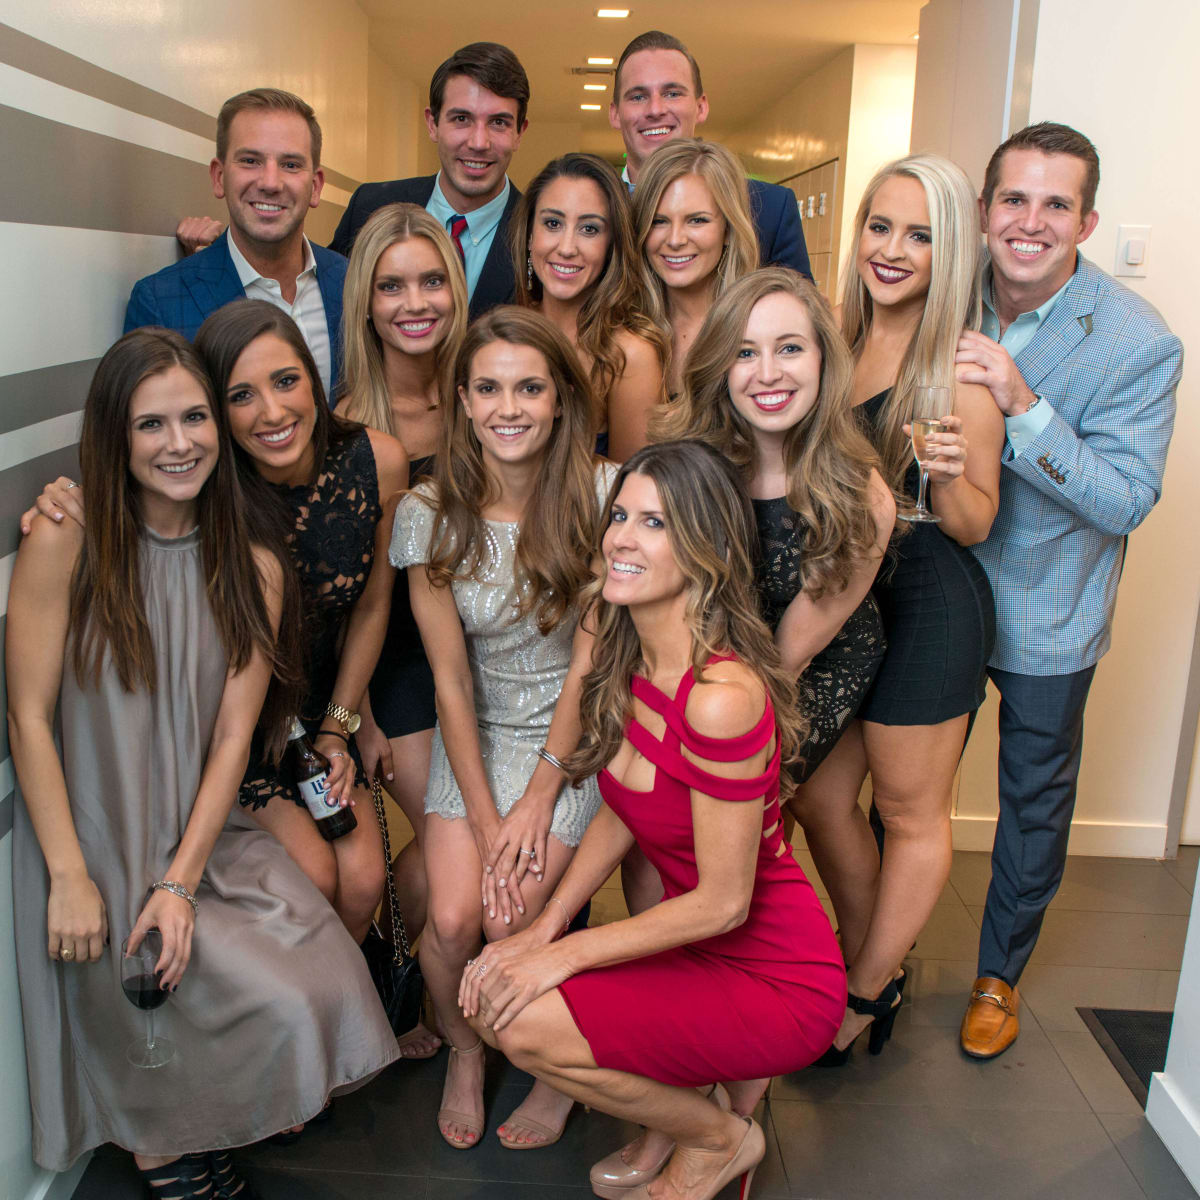 Houston, RYDE/Rose Foundation event, Oct. 2016, RYDE staff